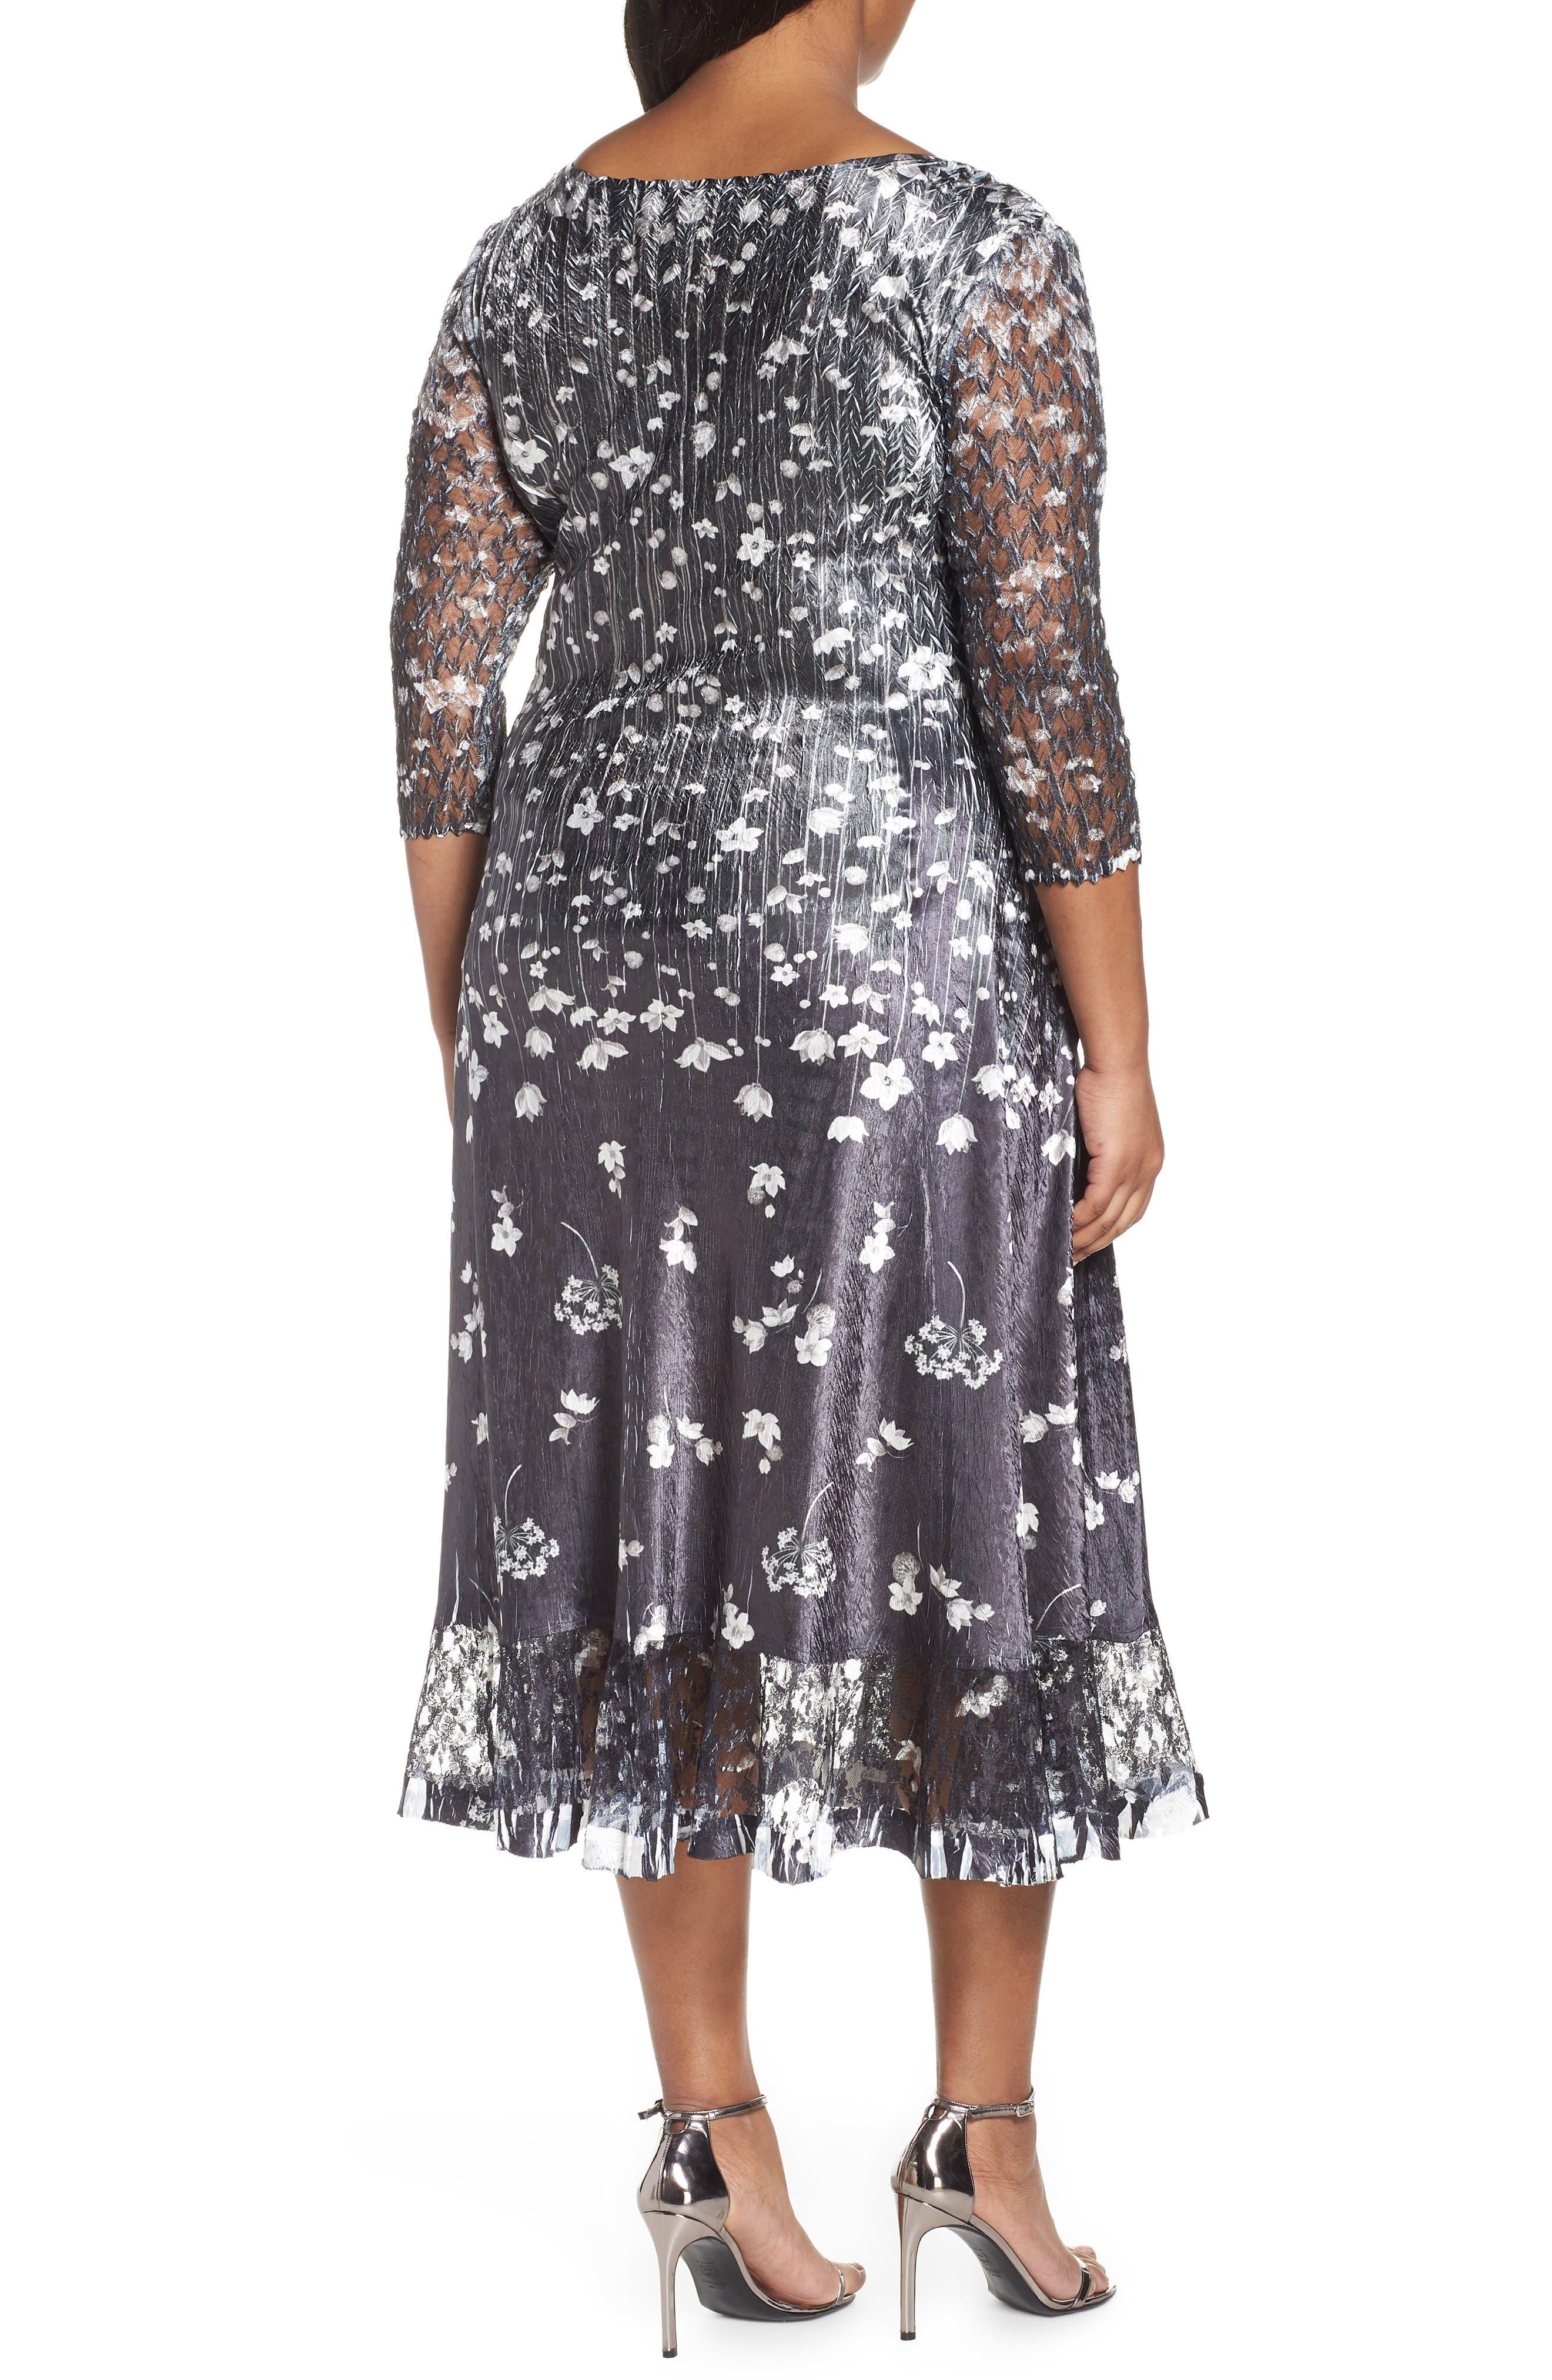 KOMAROV, Floral Print A-Line Dress, Alternate thumbnail 2, color, BLACK MEADOW